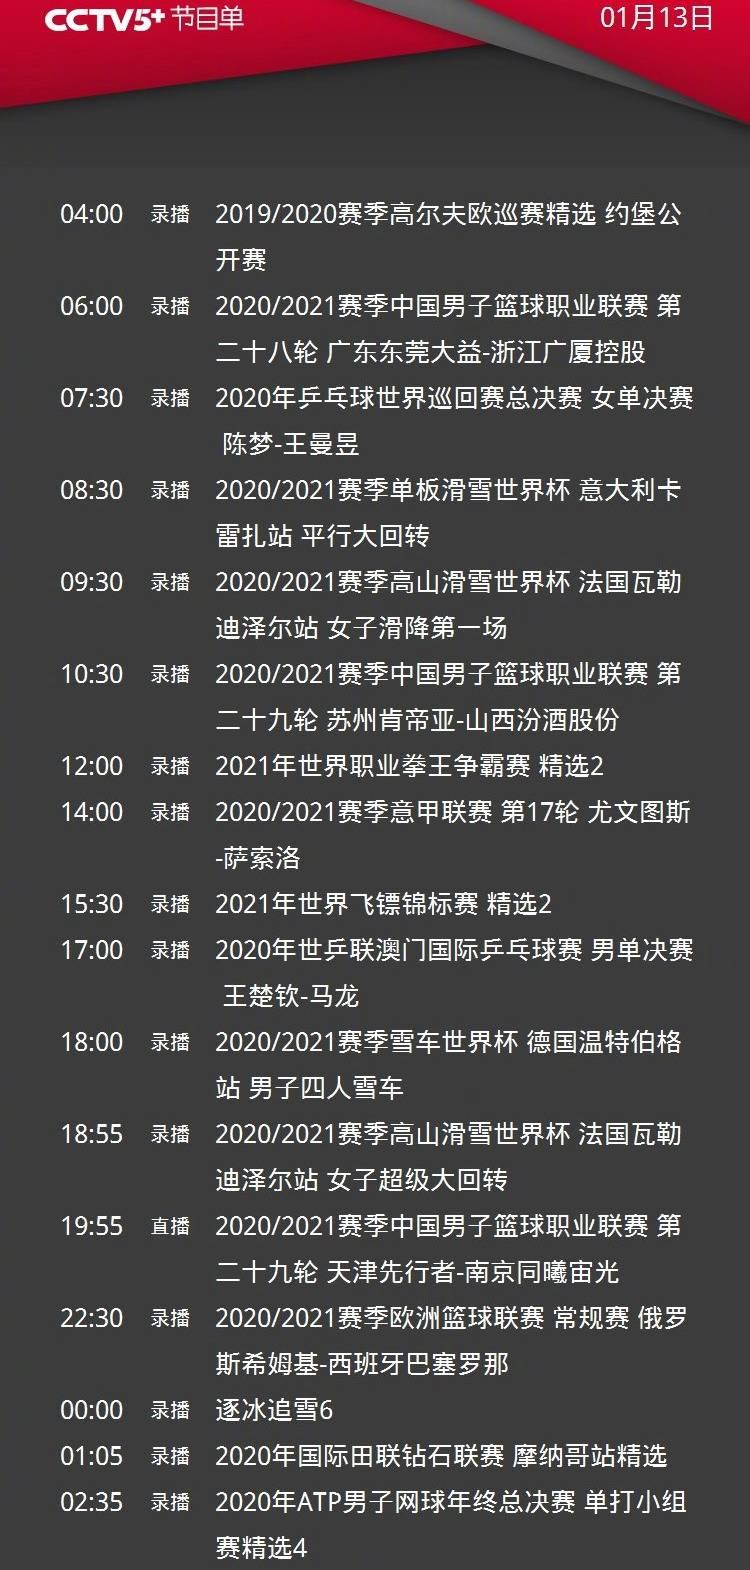 CCTV5直播CBA广东男篮vs史上最水总冠军四川+斯诺克大师赛丁俊晖PK奥沙利文